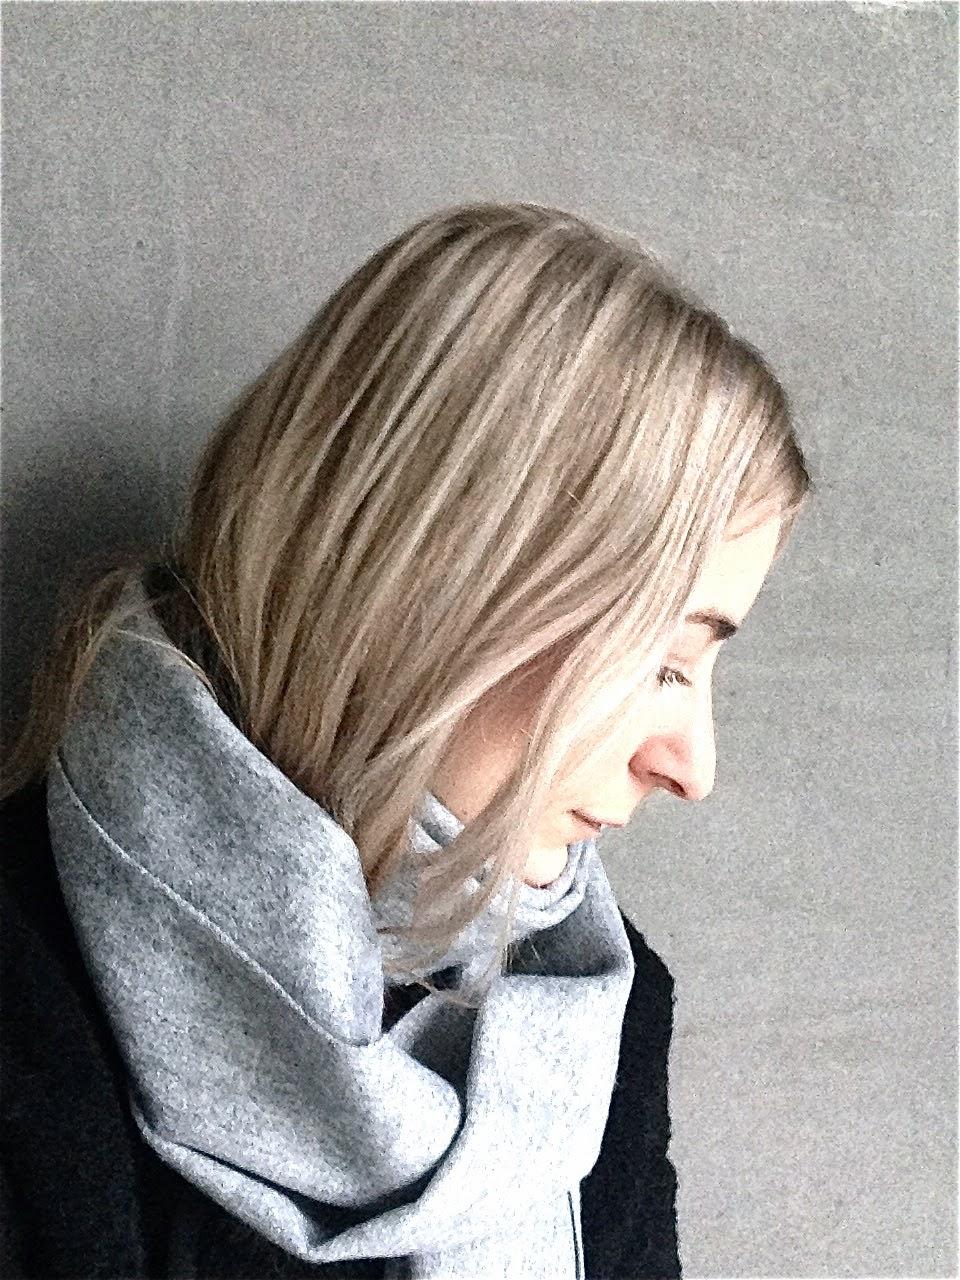 Woll Scarf, Premium Quality H&M, Libertine-Libertine, Wool Coat